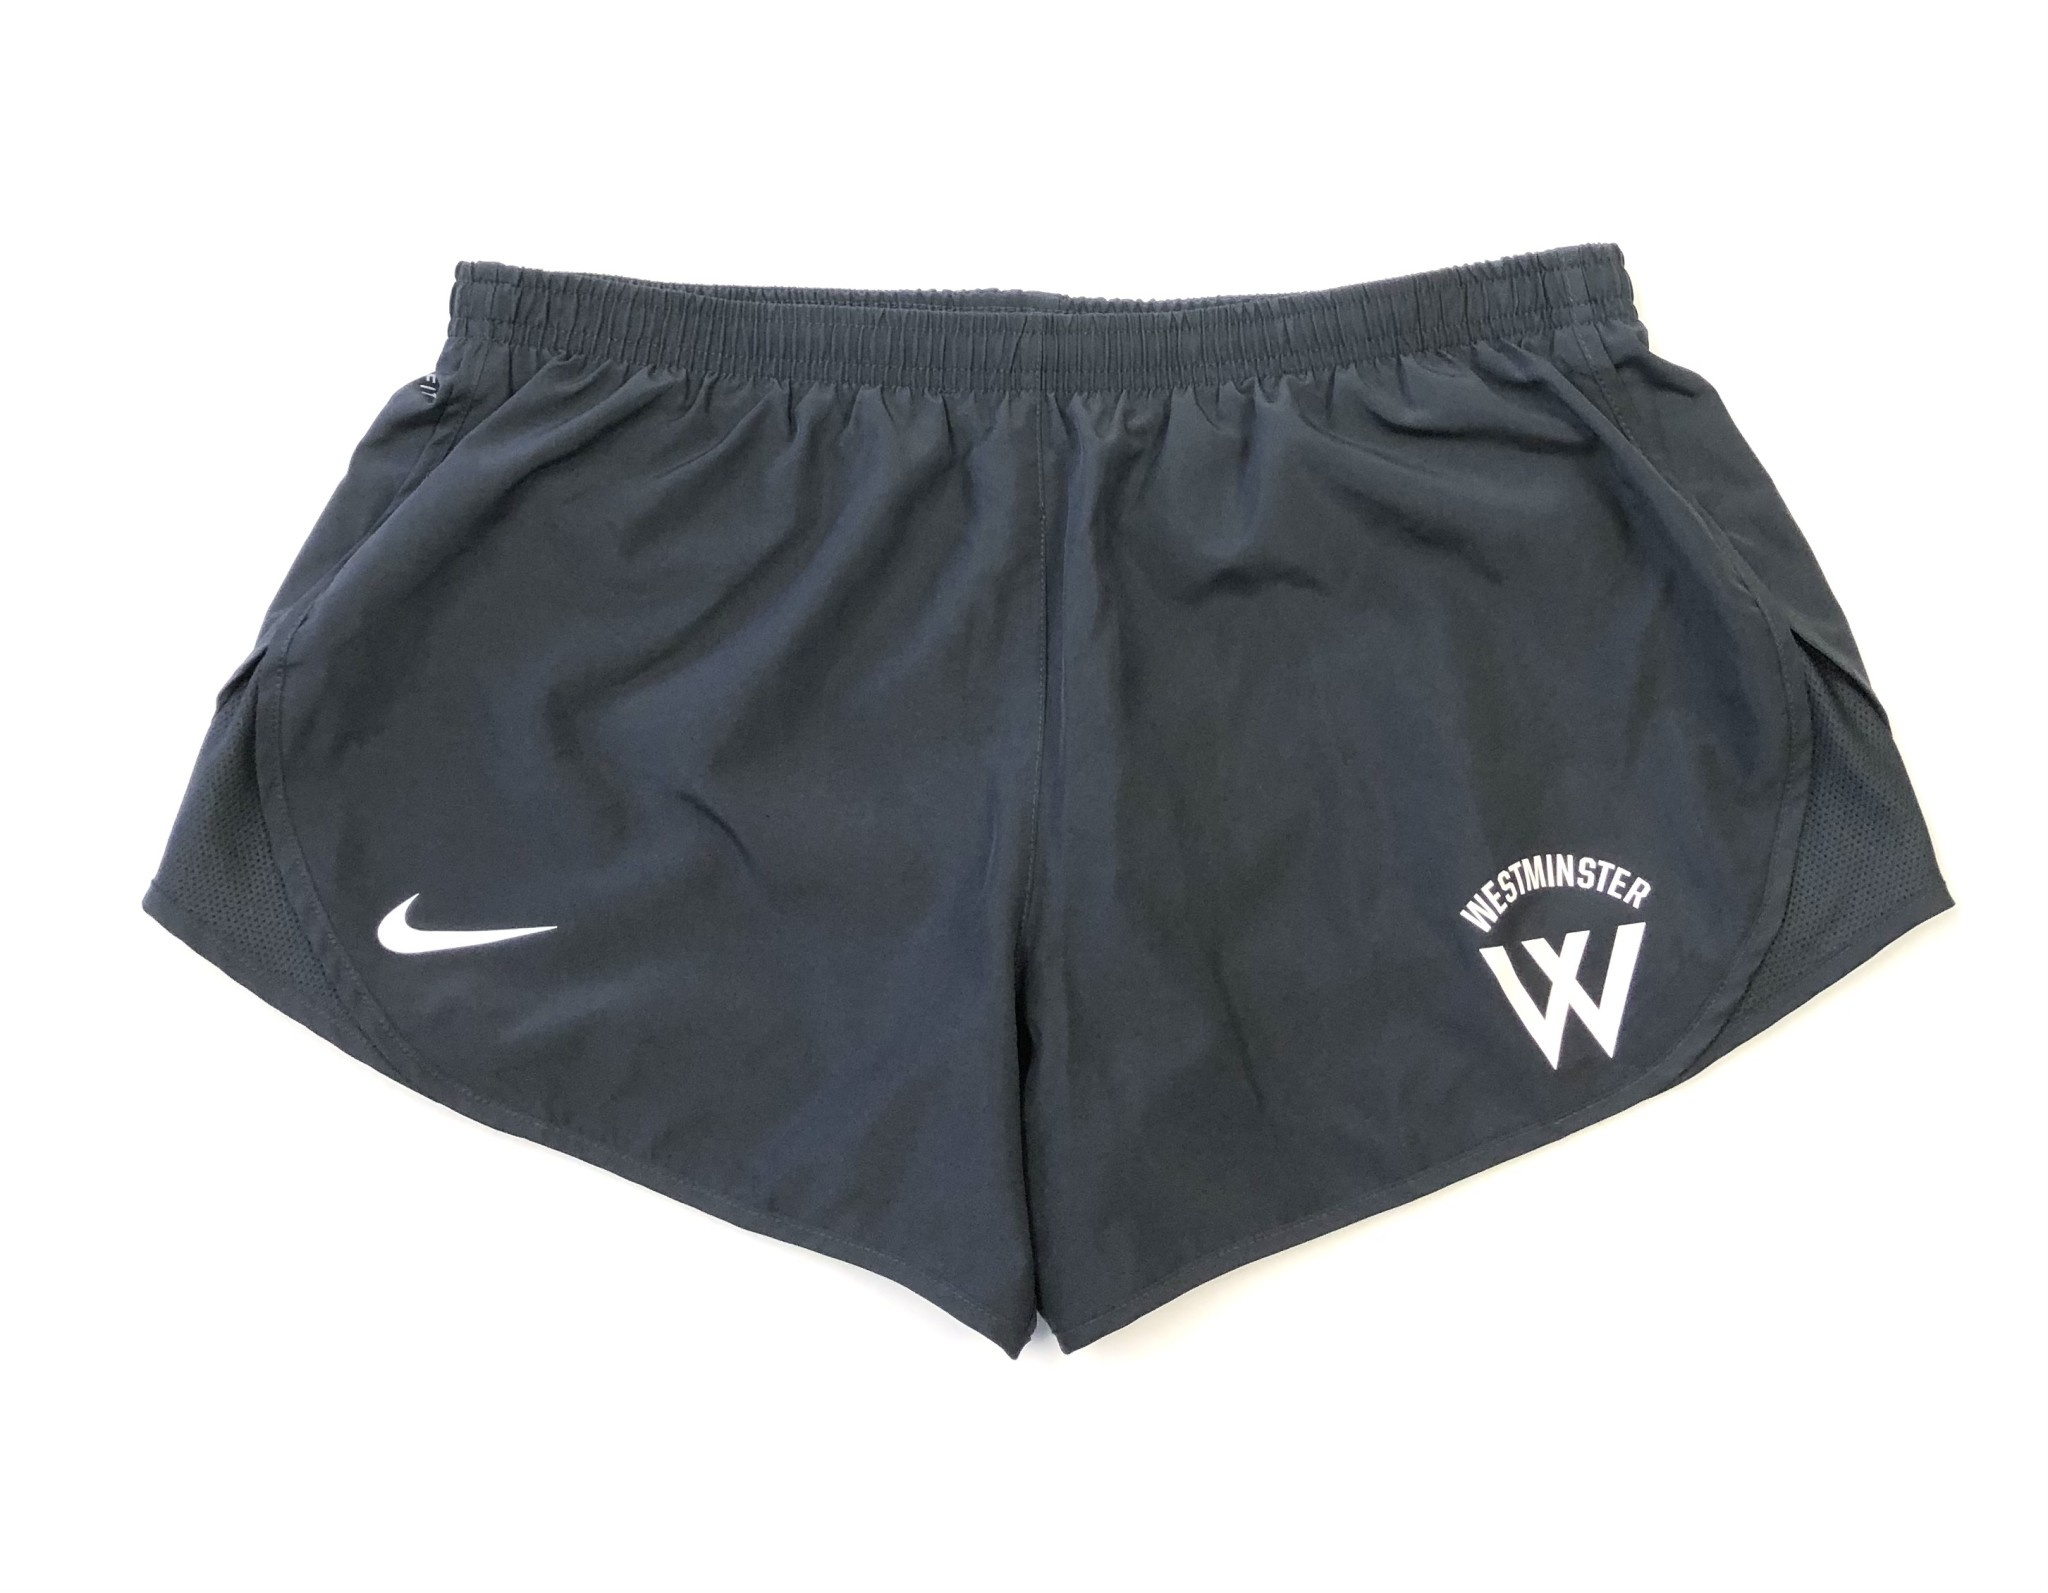 Nike Shorts: Nike Women's Tempo Anthrac Westminster w/W